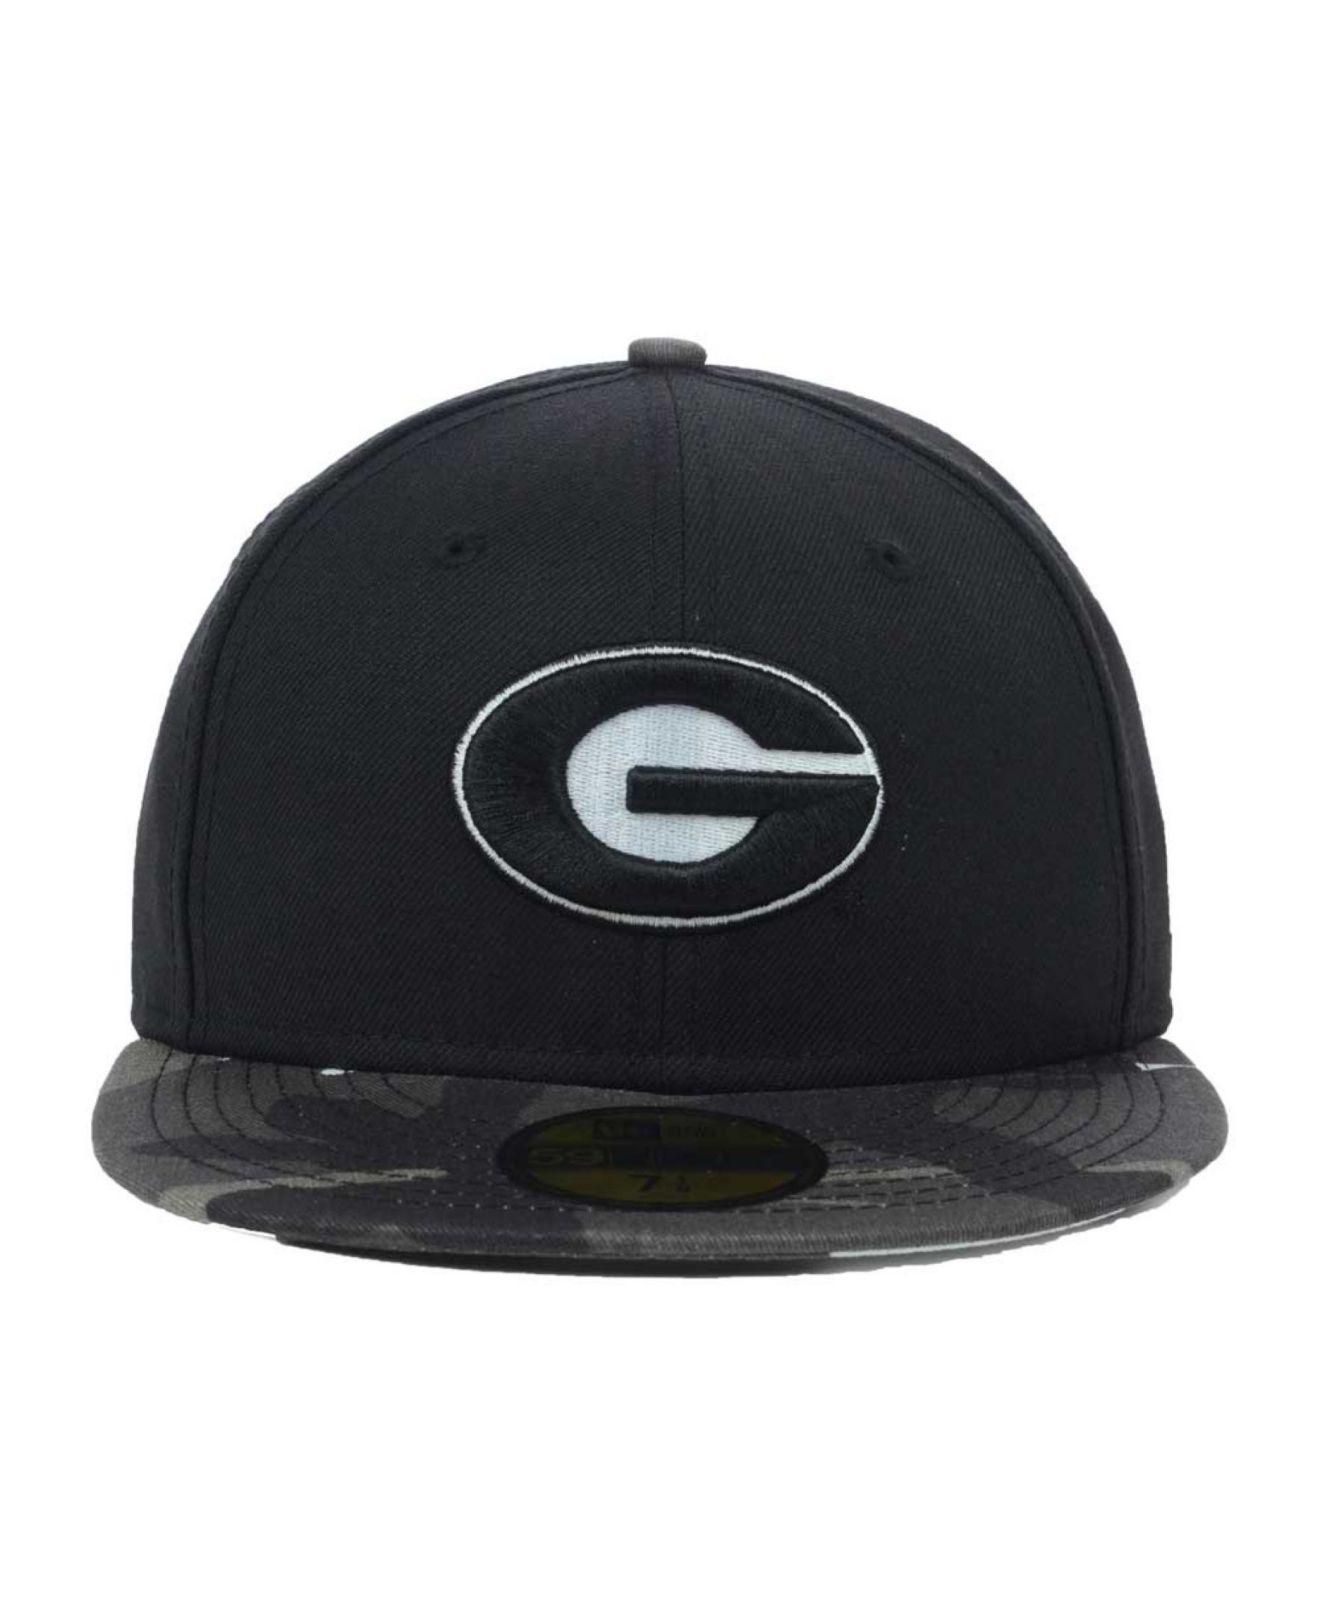 4f577c852b0 Lyst - KTZ Georgia Bulldogs Urban Camo 59fifty Cap in Black for Men